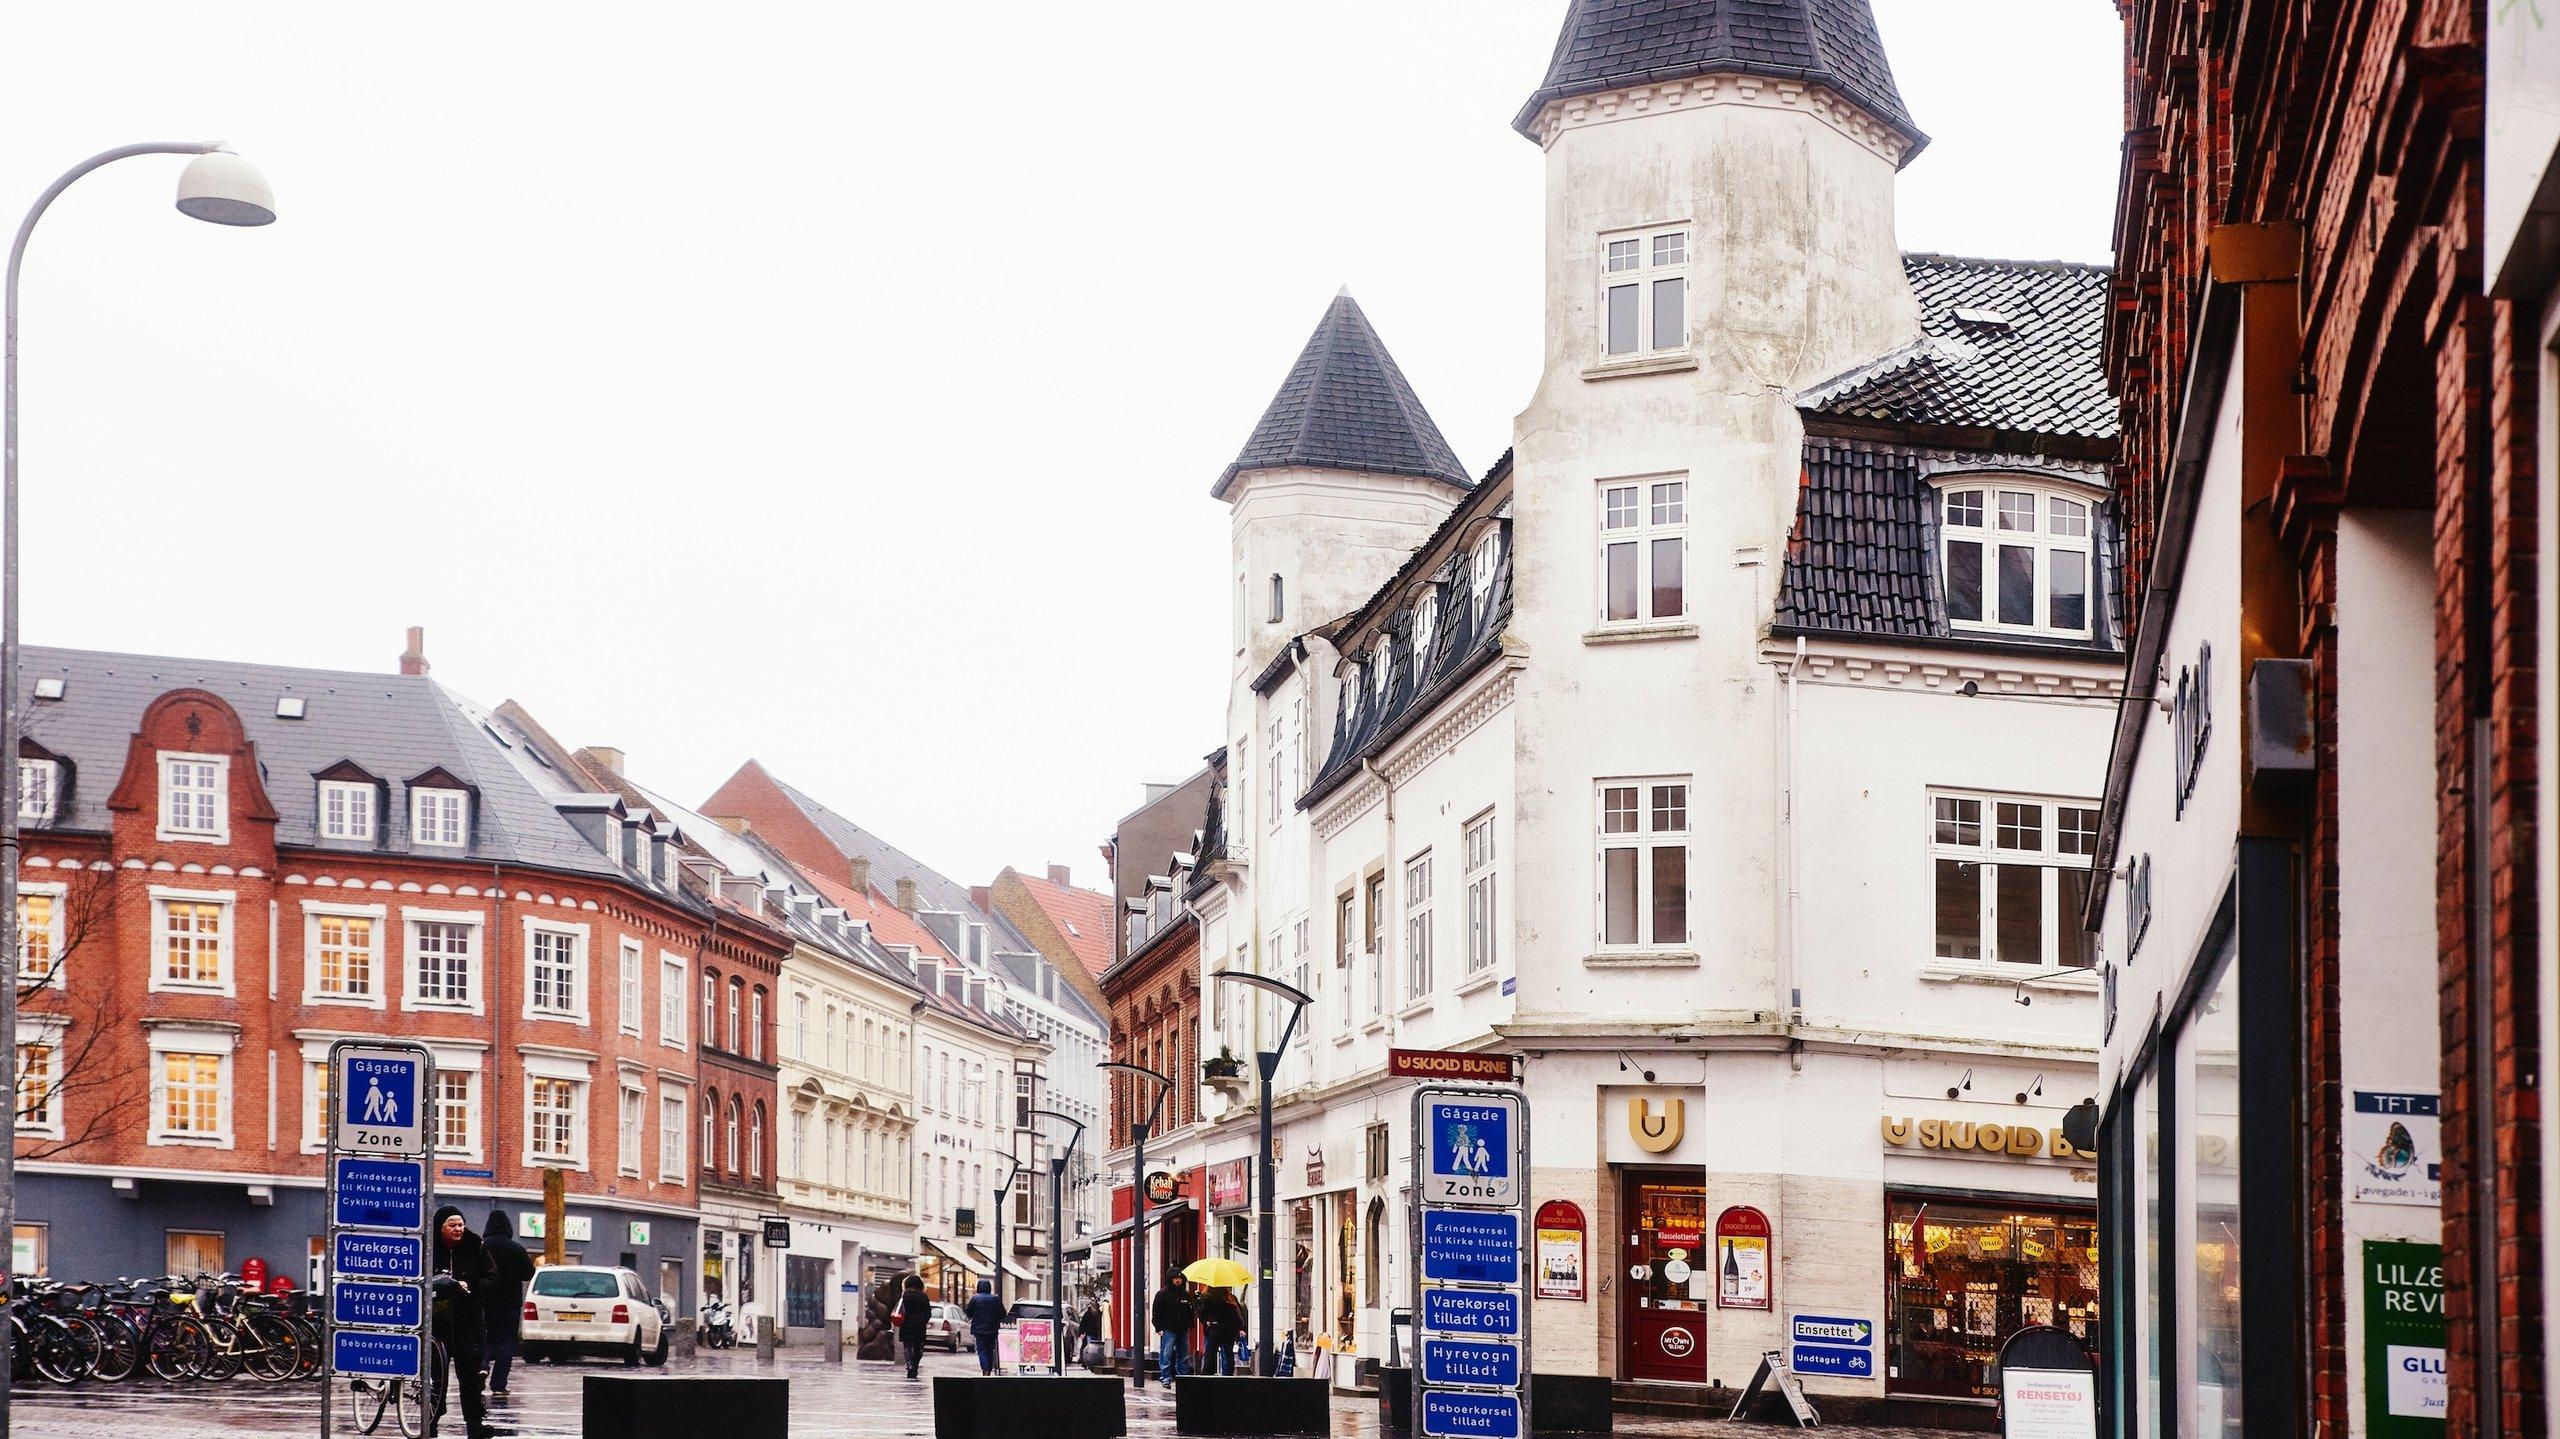 Vestsjaelland (county), Sjaelland, Denmark